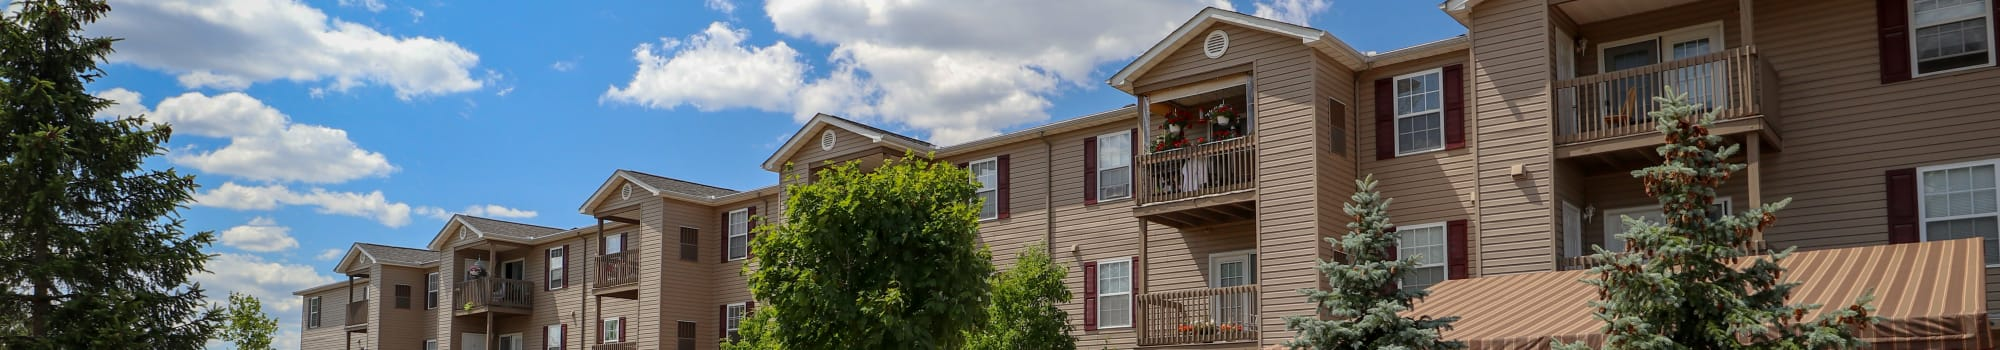 Pet friendly apartments in Getzville